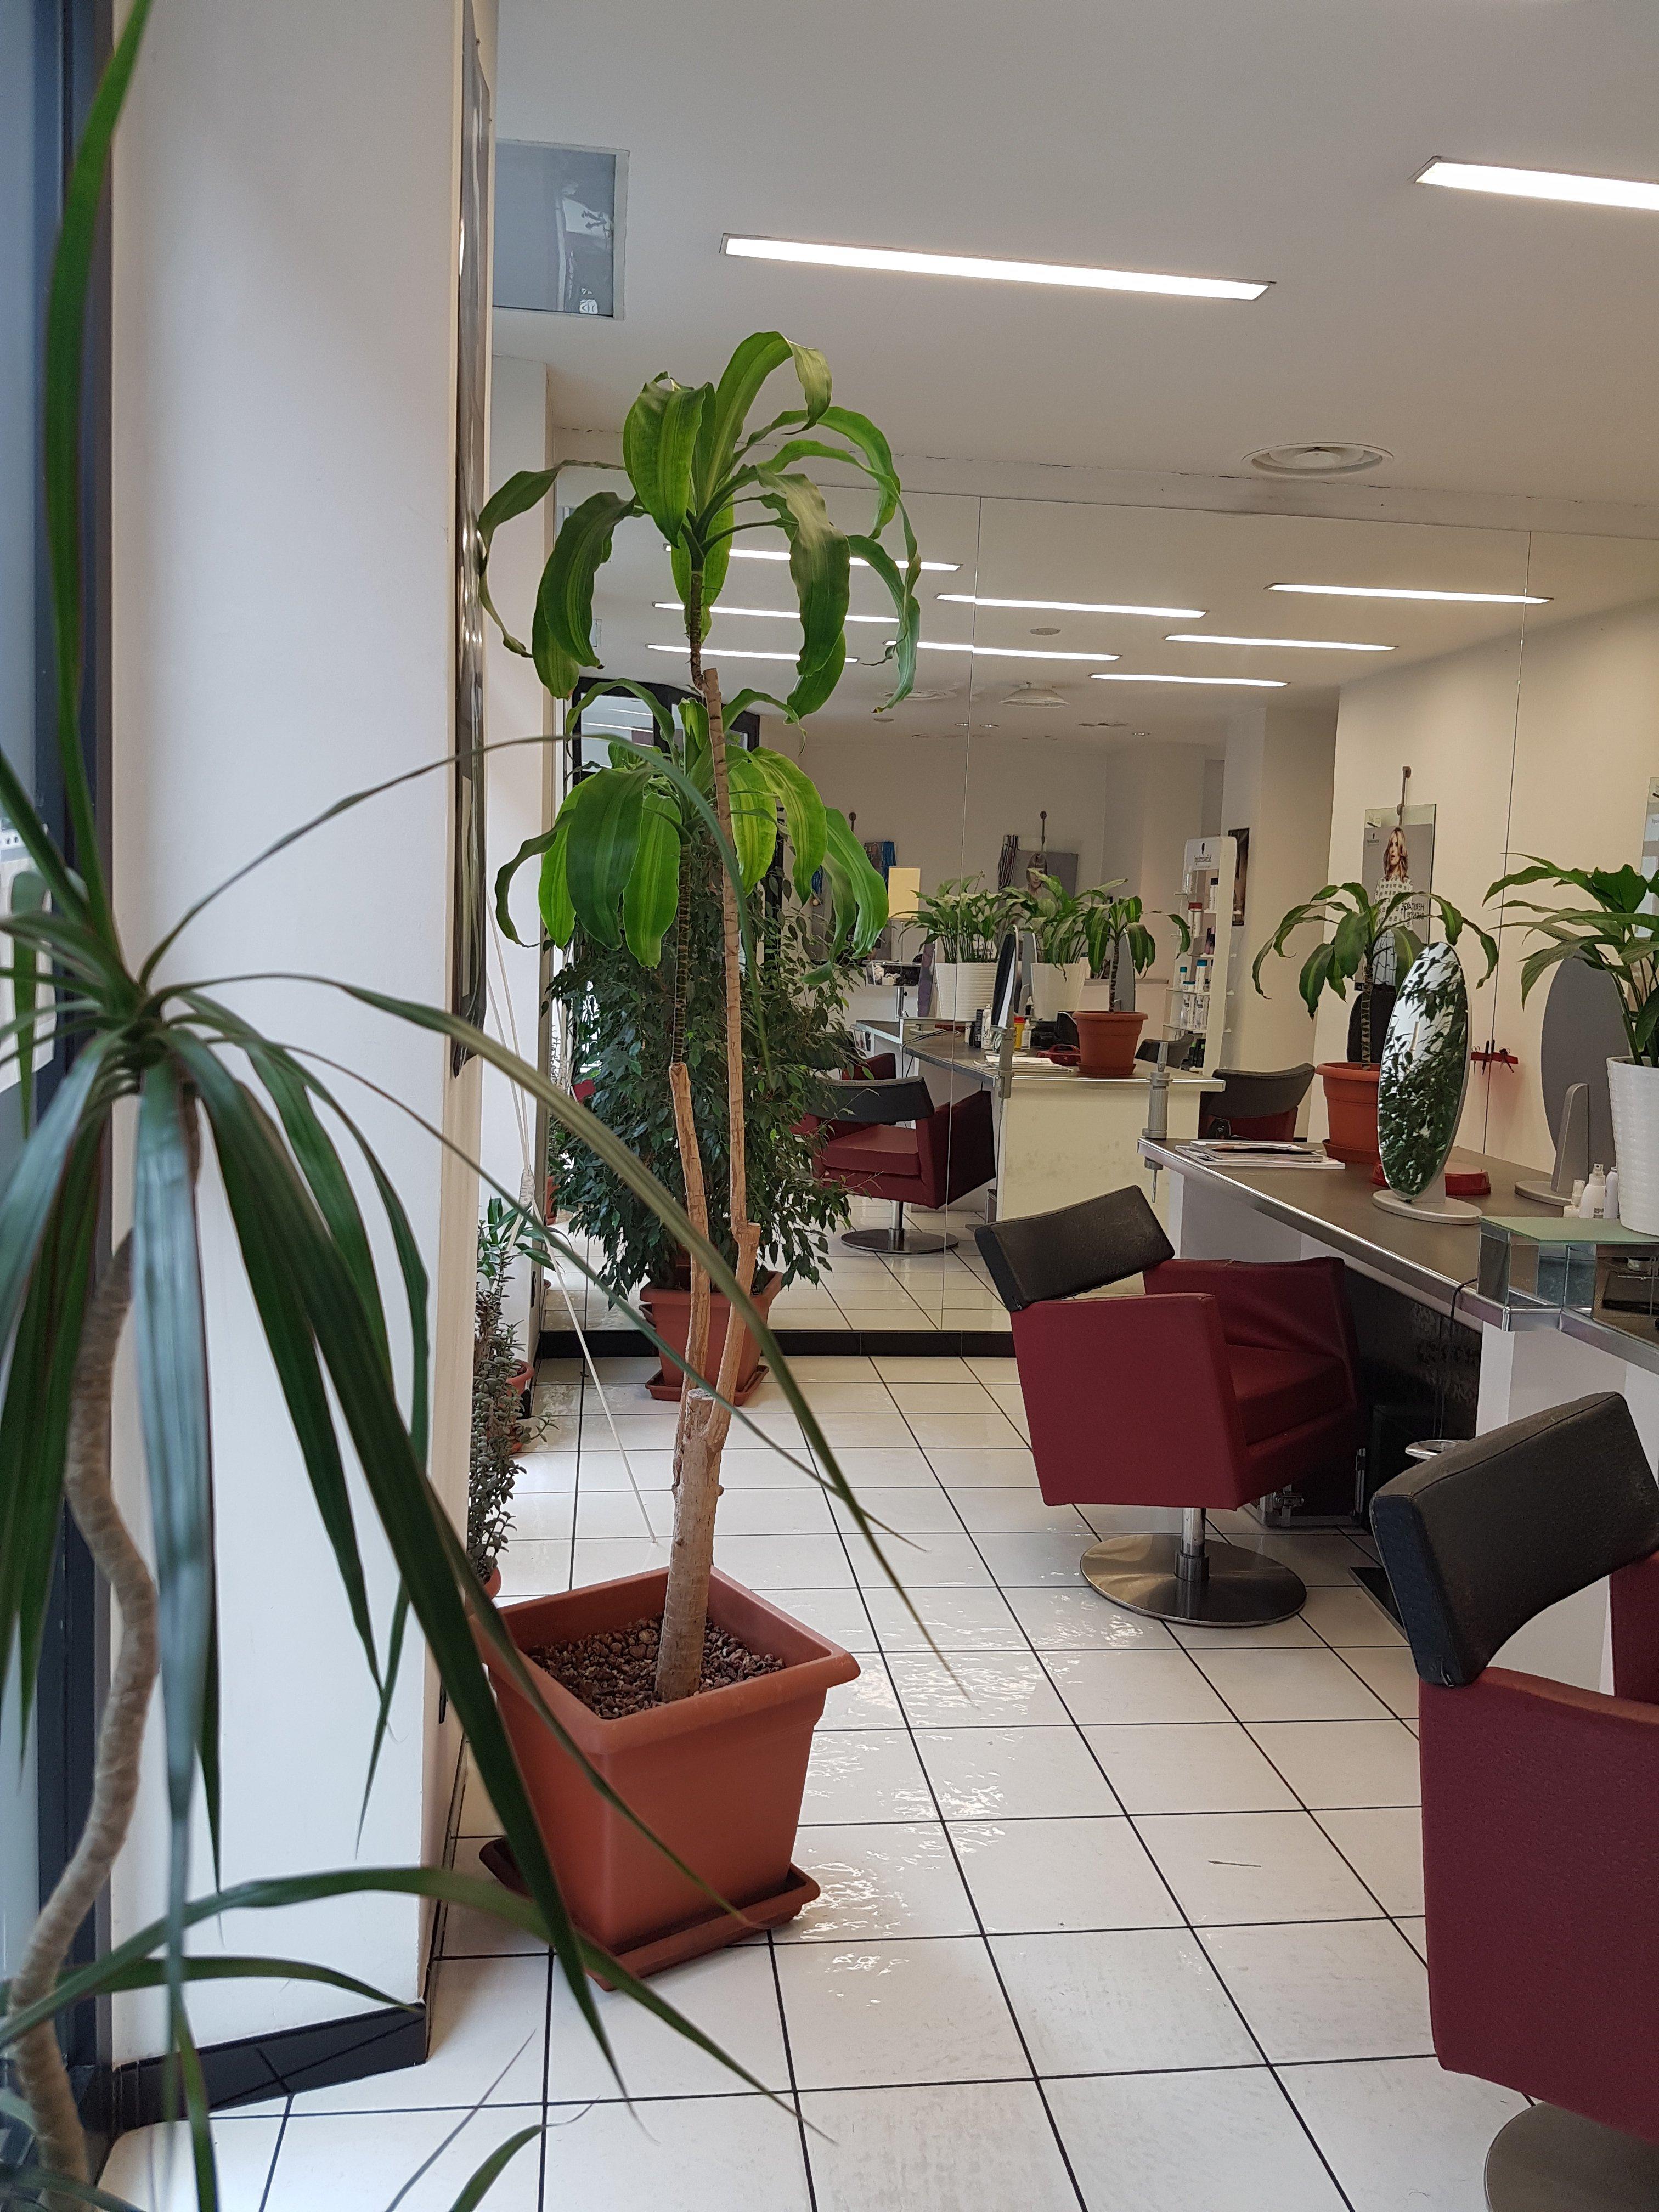 sala di un parrucchiere con pianta verde